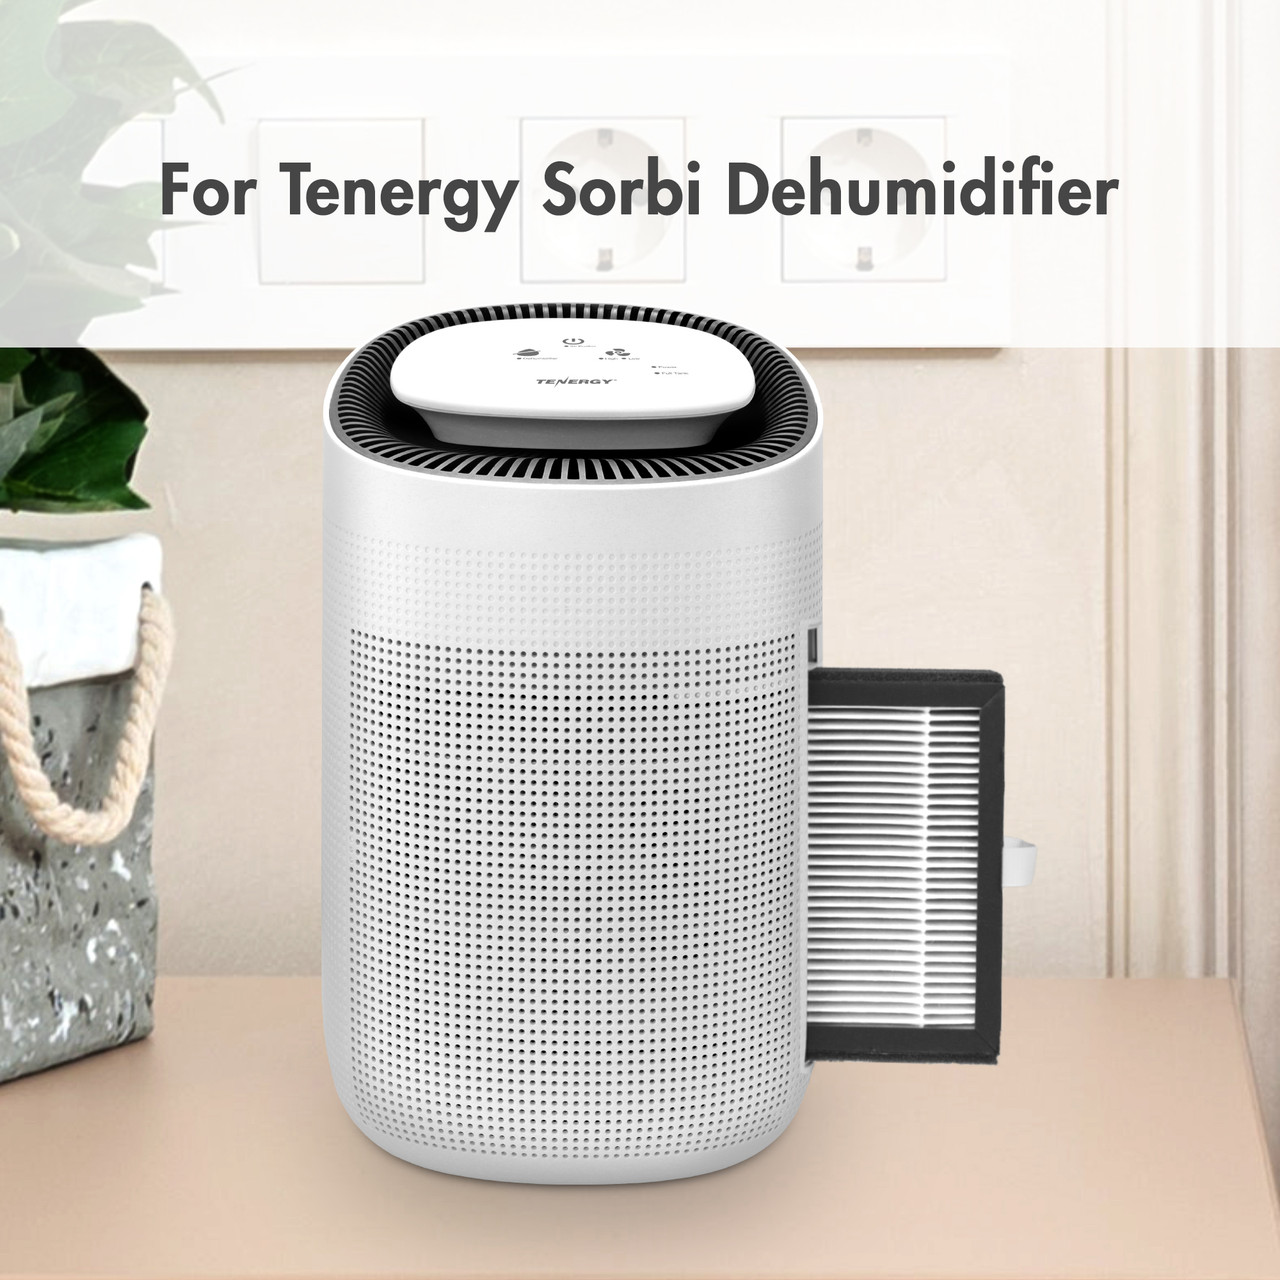 Replacement HEPA Filter for Sorbi 1000ml